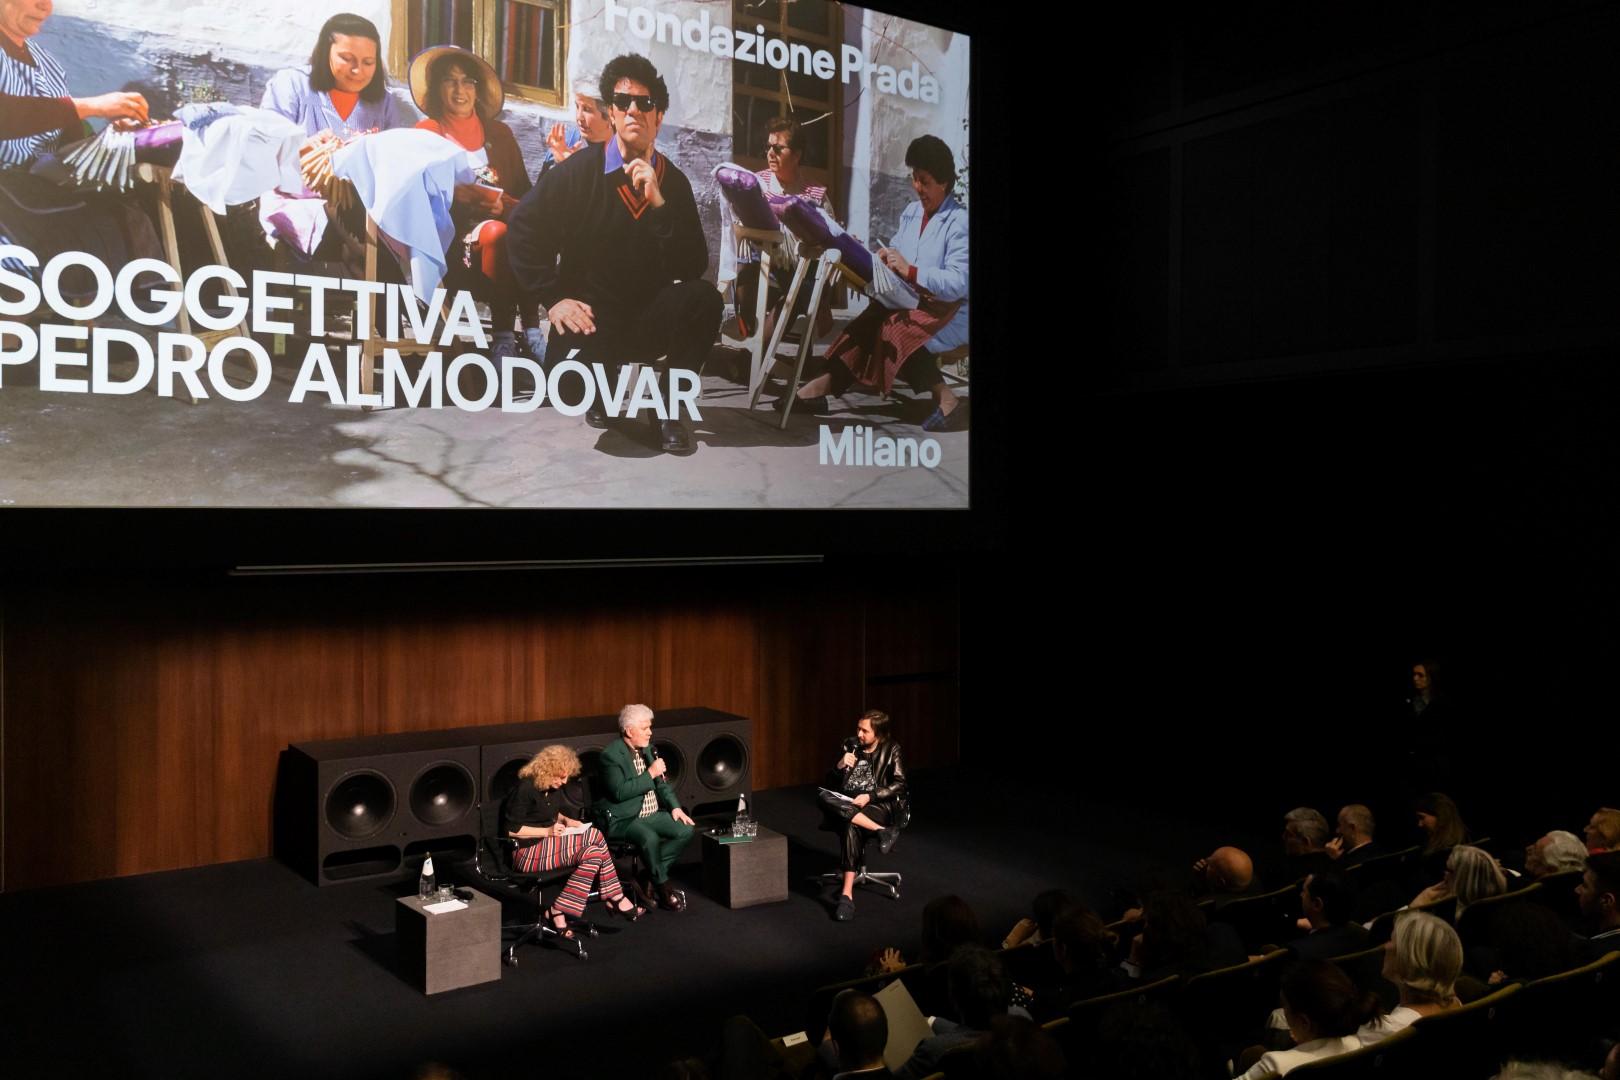 Fondazione Prada Pedro Almodovar